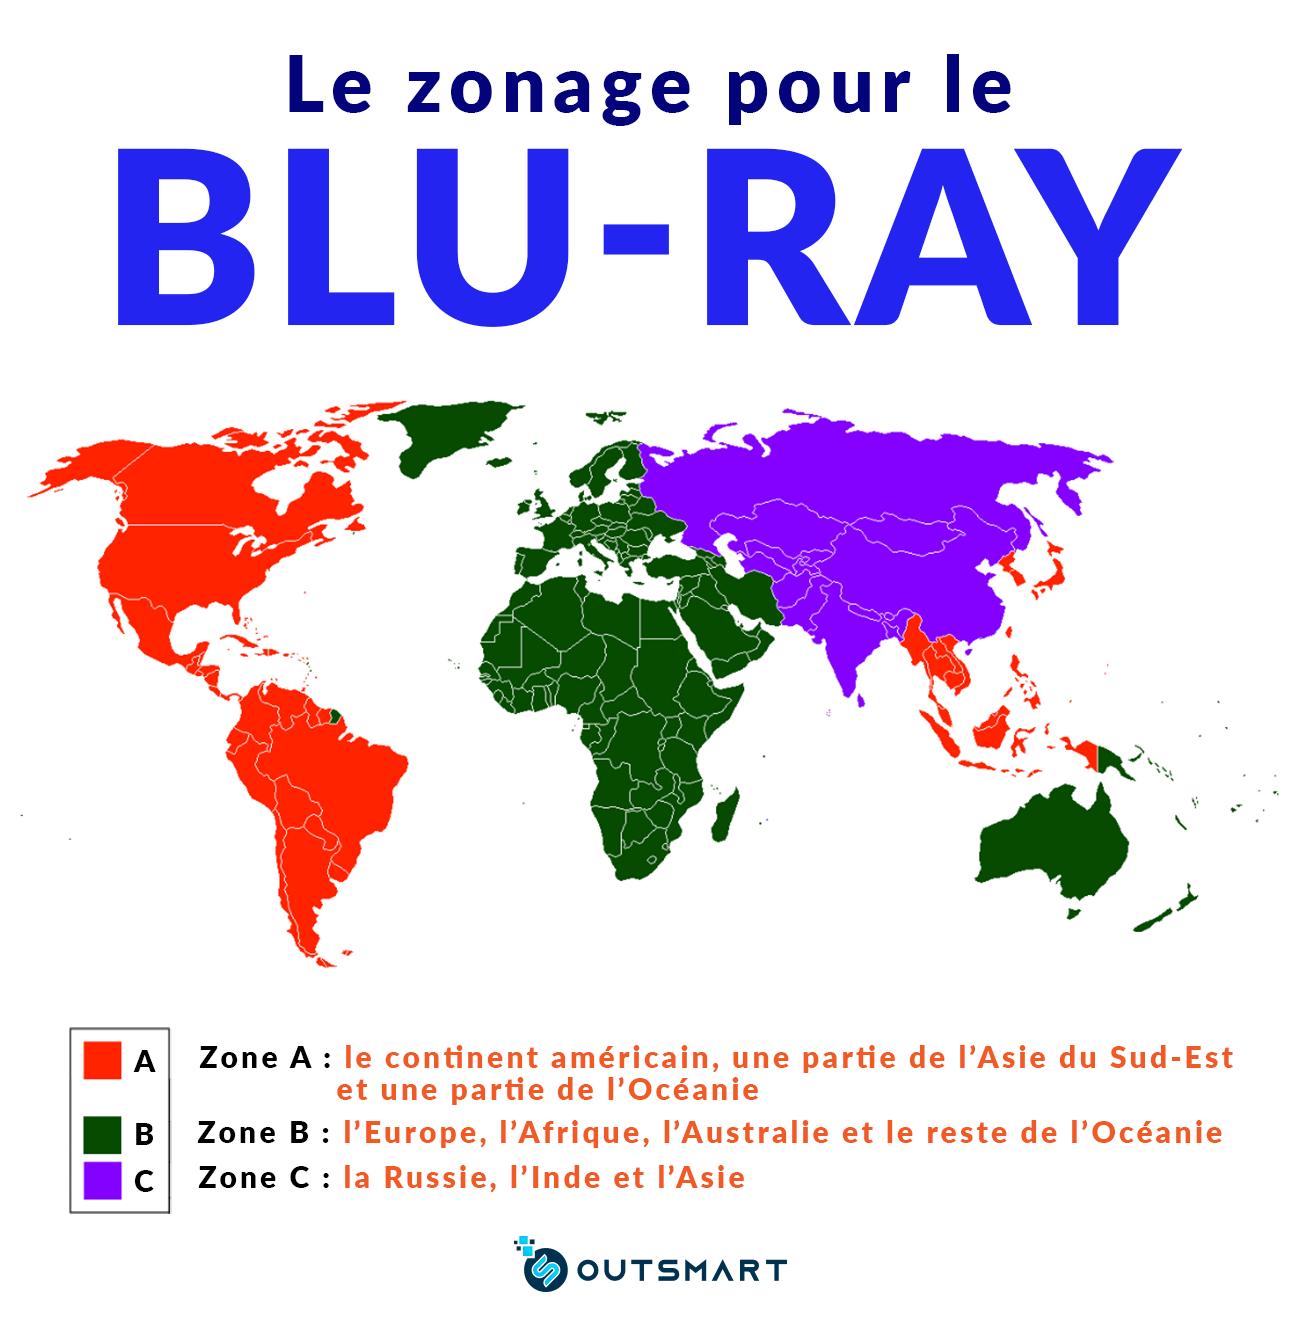 zonage blu-ray